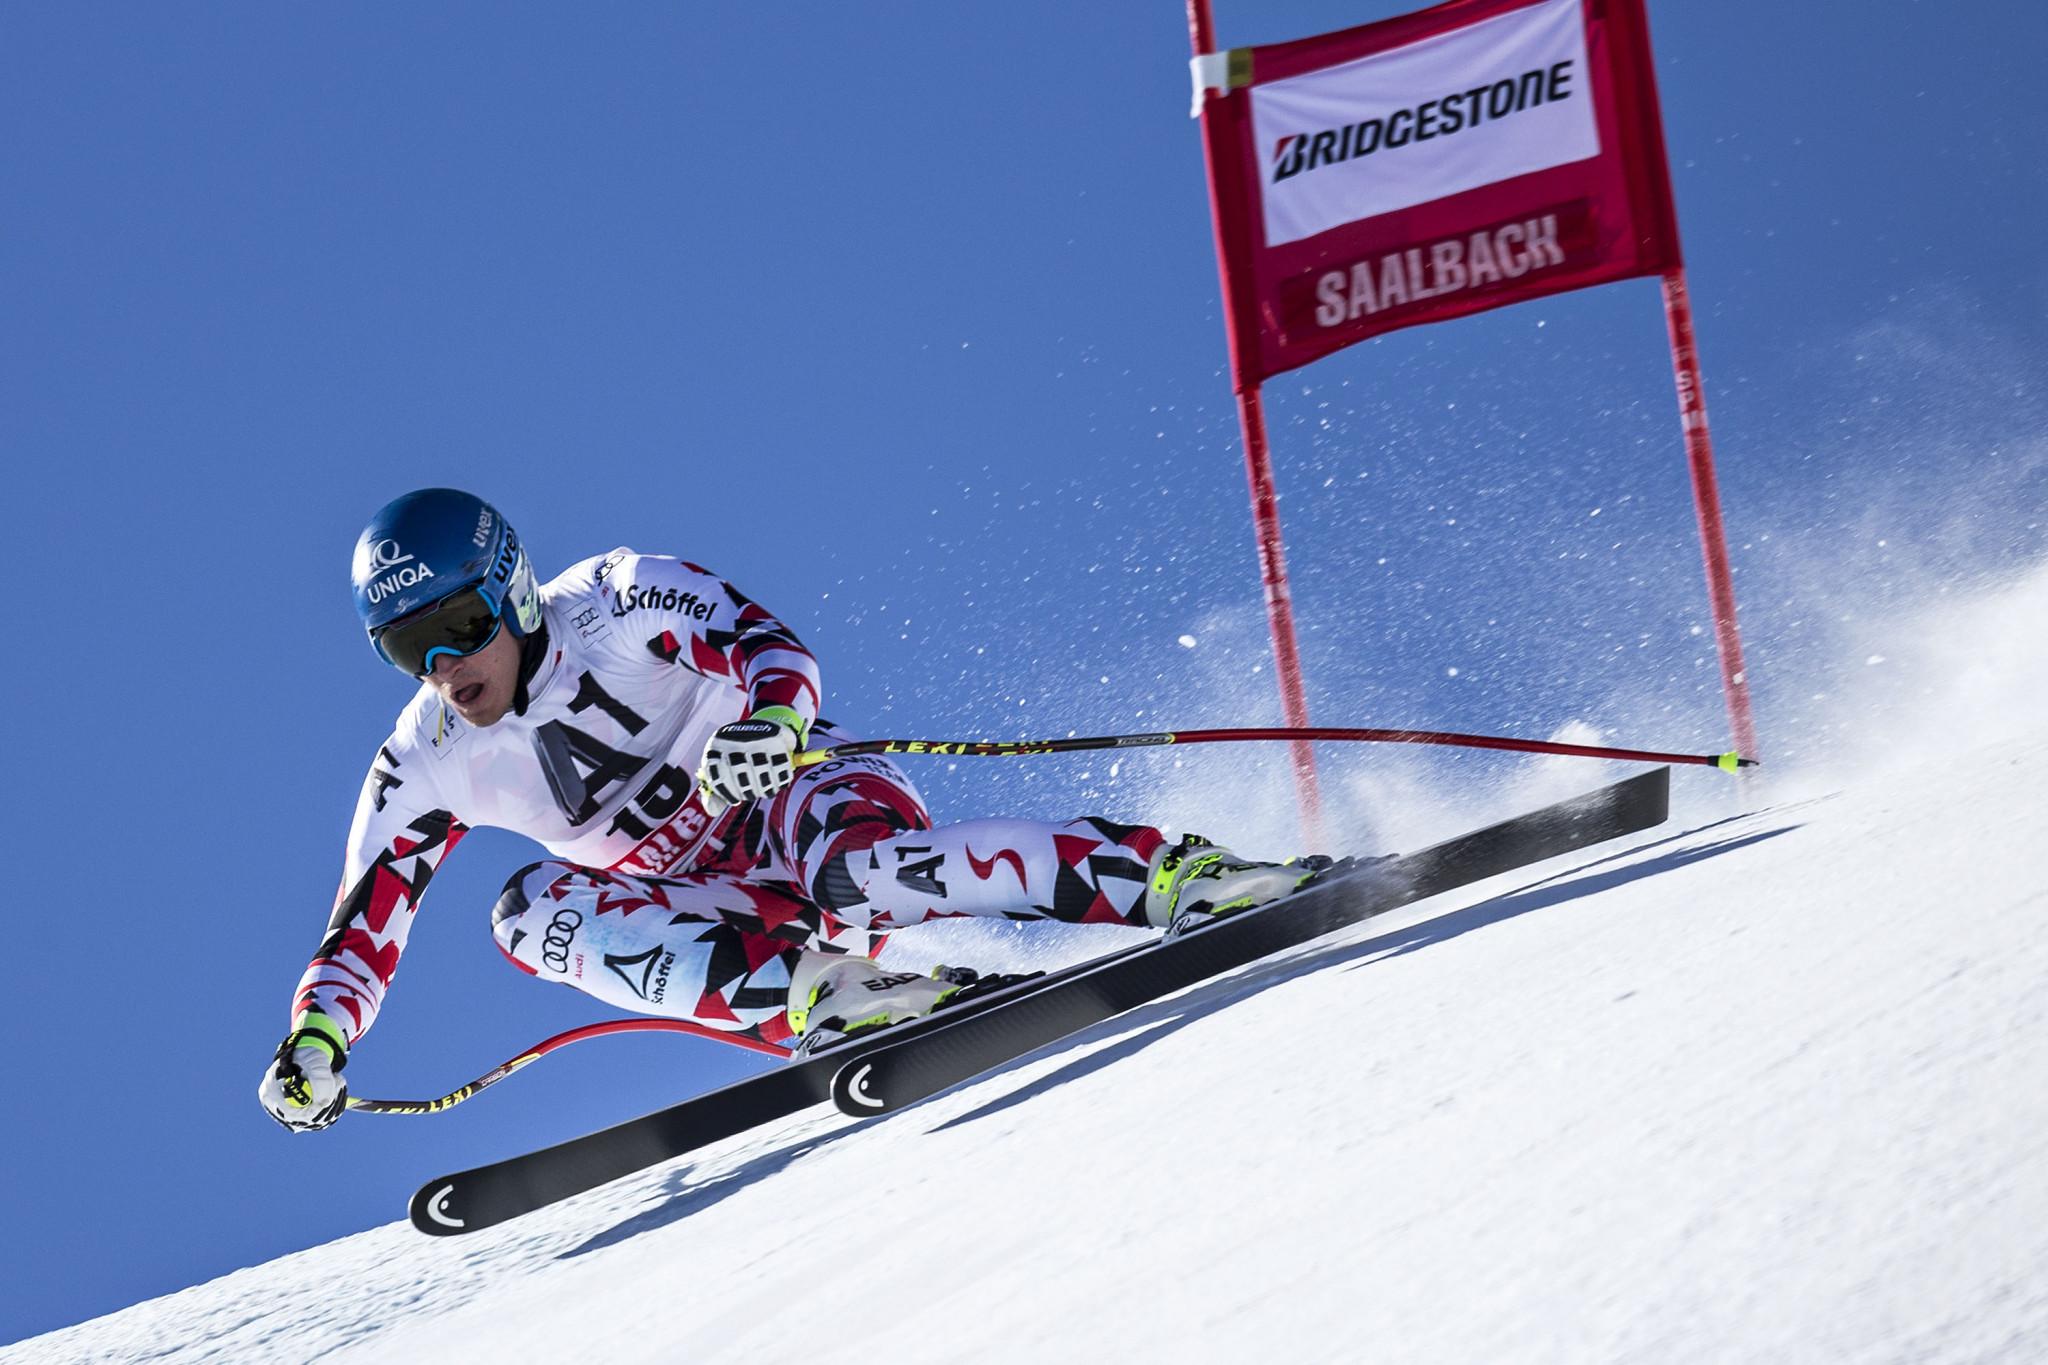 Saalbach to host 2025 Alpine World Ski Championships